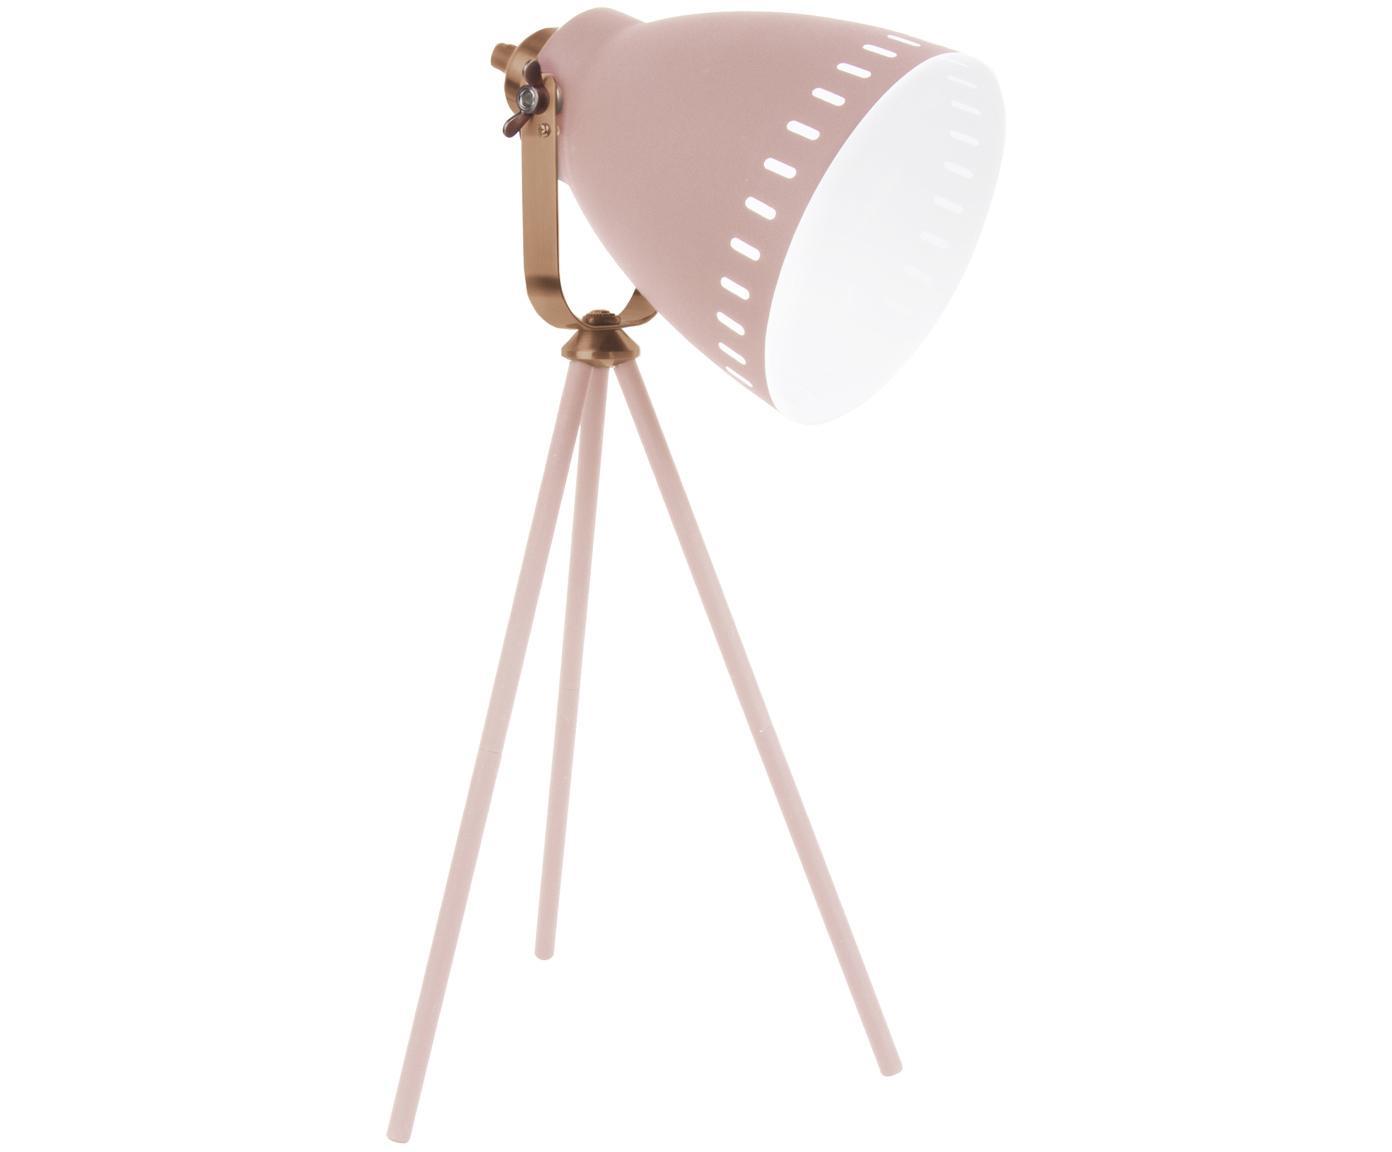 Lampada da tavolo industriale Mingle, Bianco, rame, Larg. 27 x Alt. 54 cm